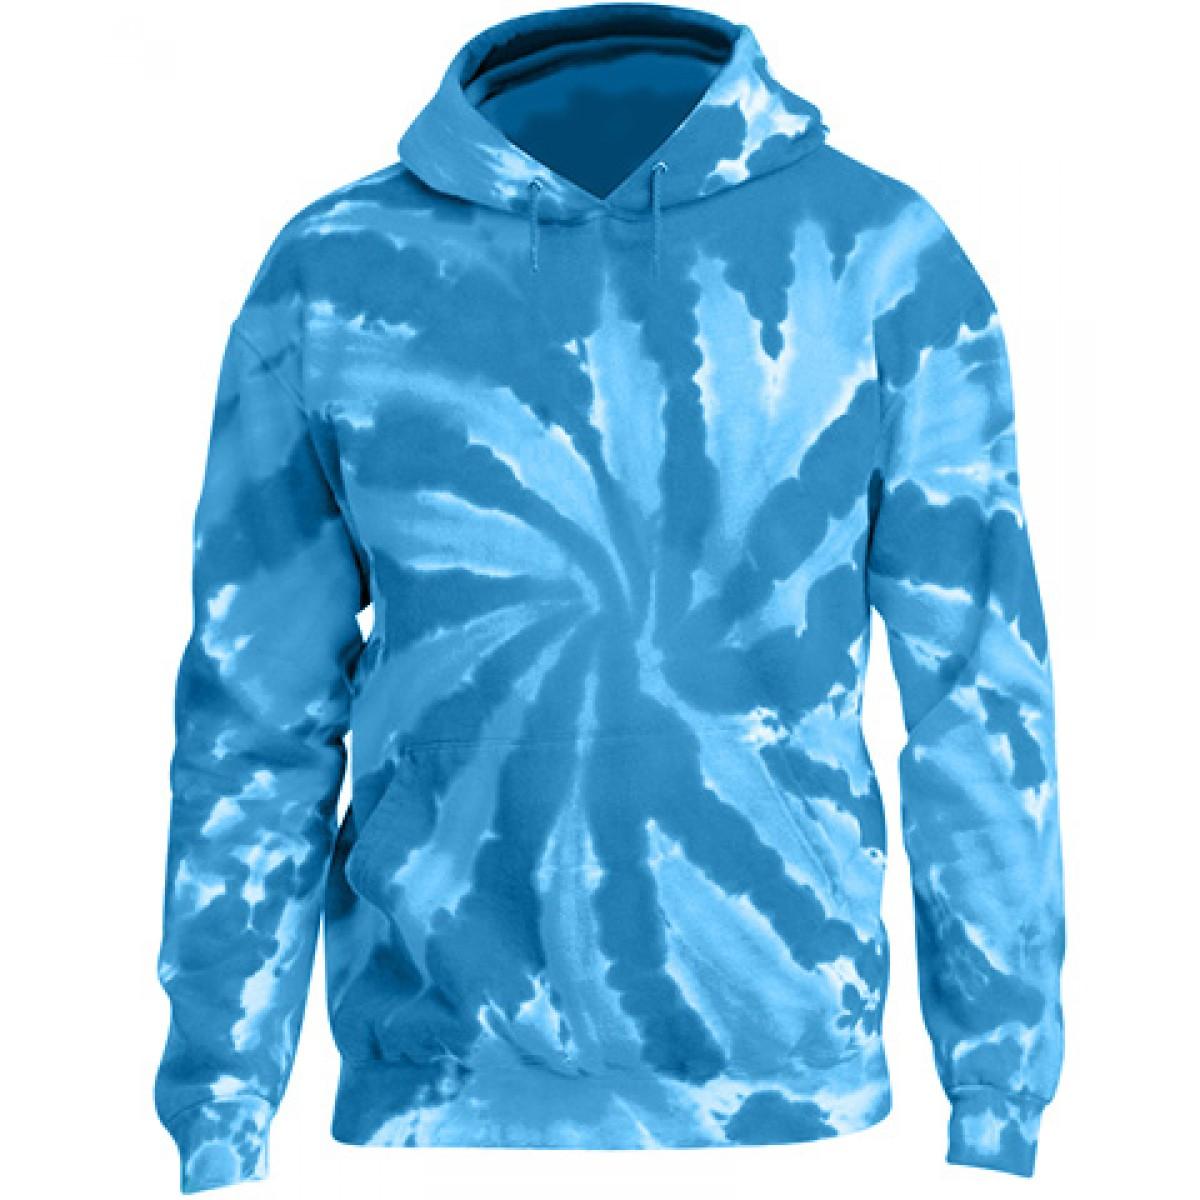 Tie-Dye Pullover Hooded Sweatshirt-Blue-YS